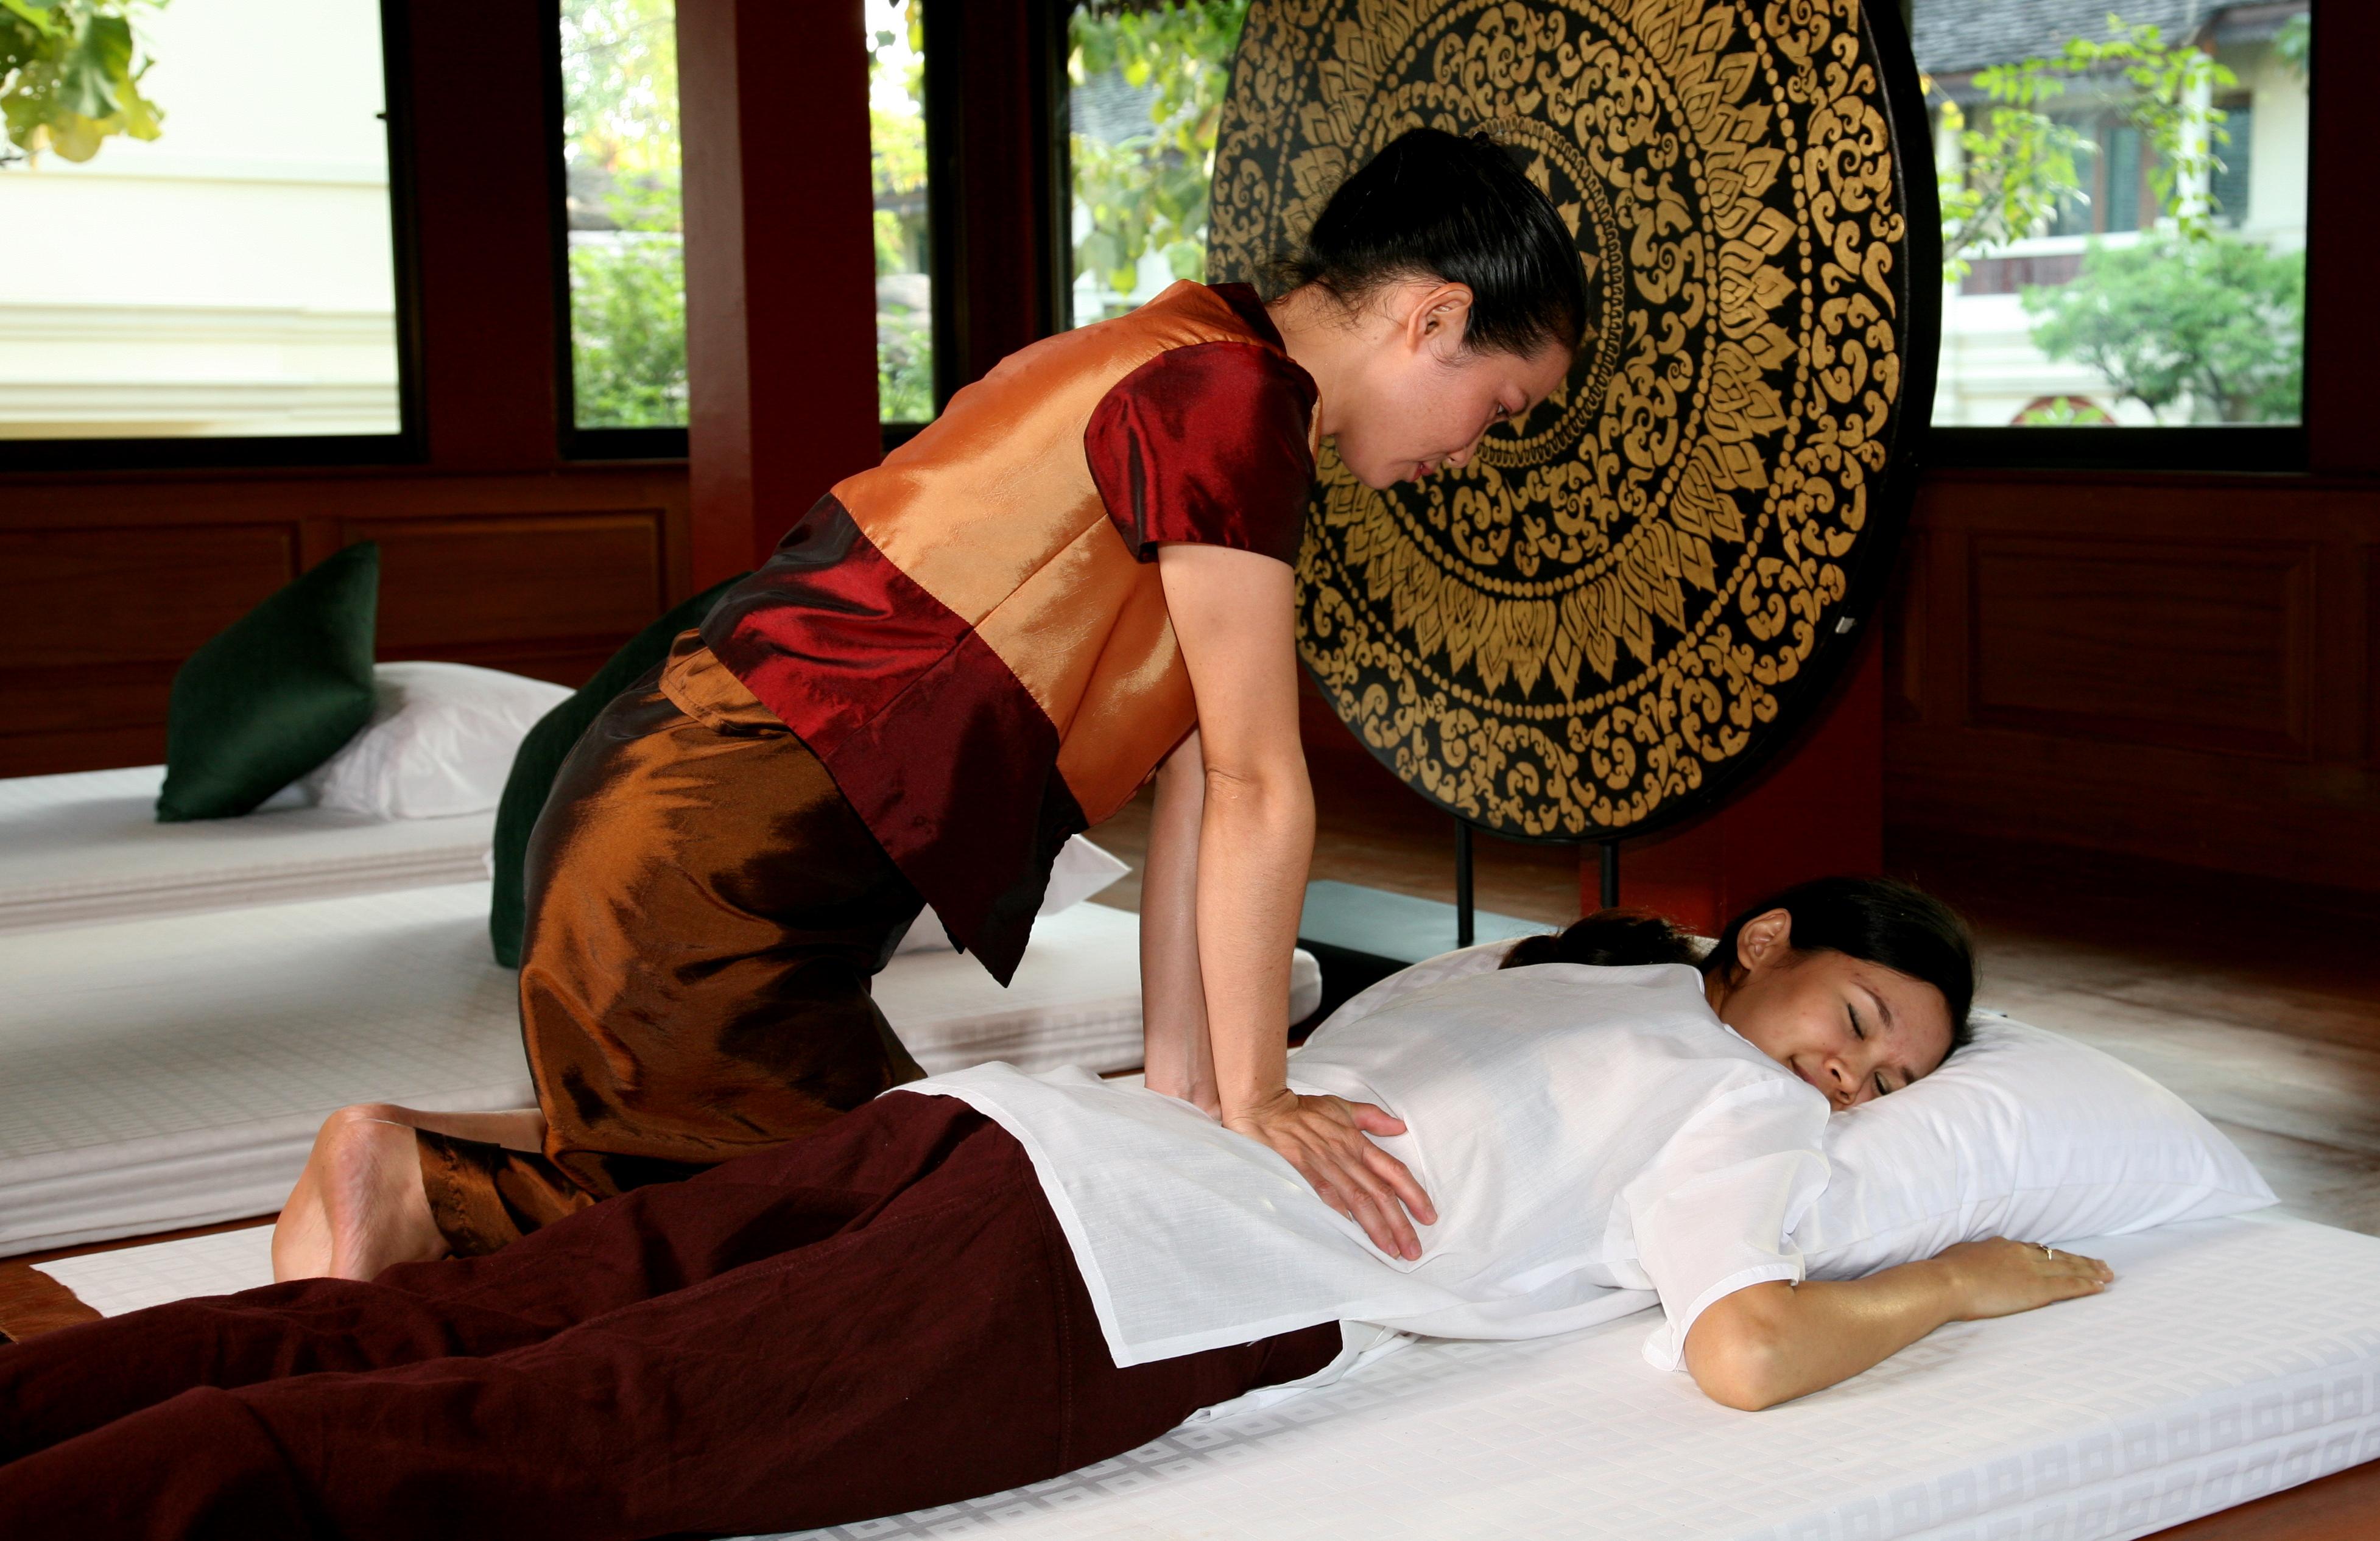 Райский массаж фото 12 фотография